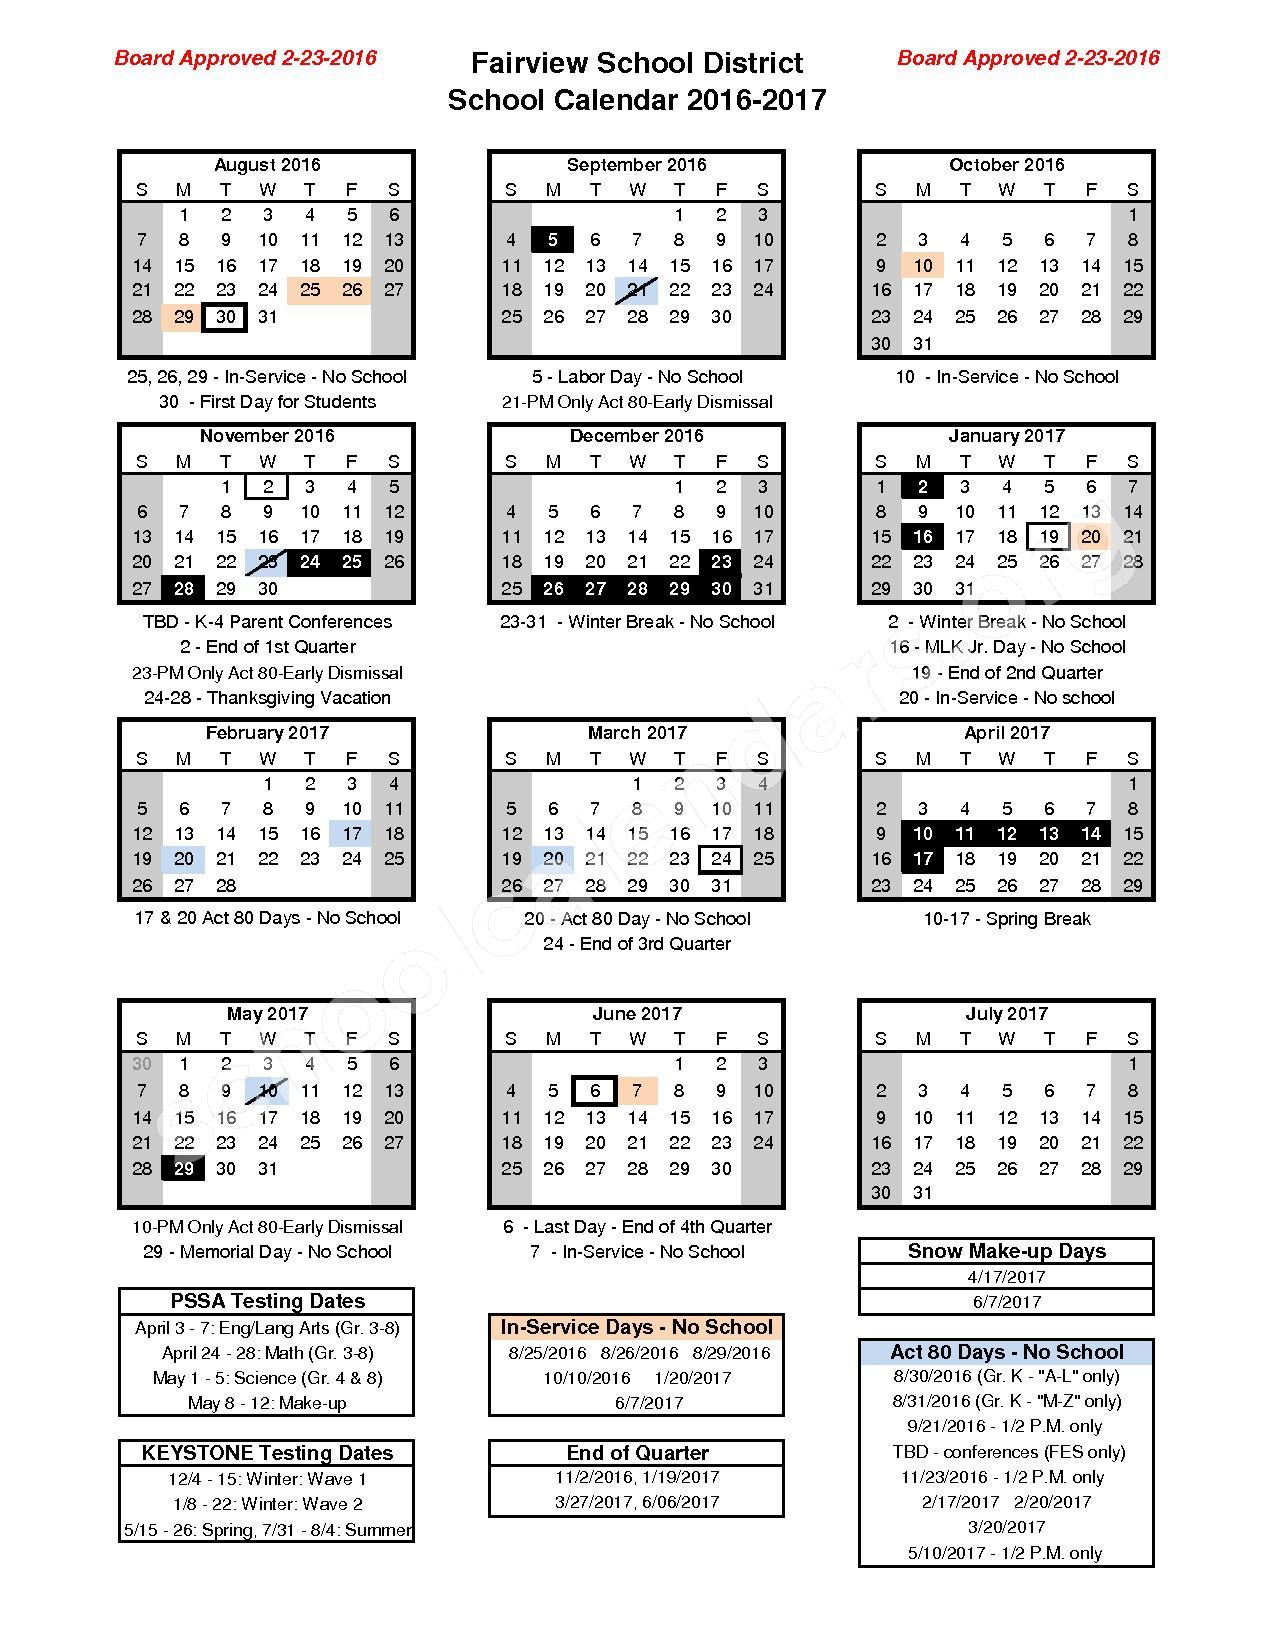 2016 - 2017 School Calendar – Fairview School District – page 1